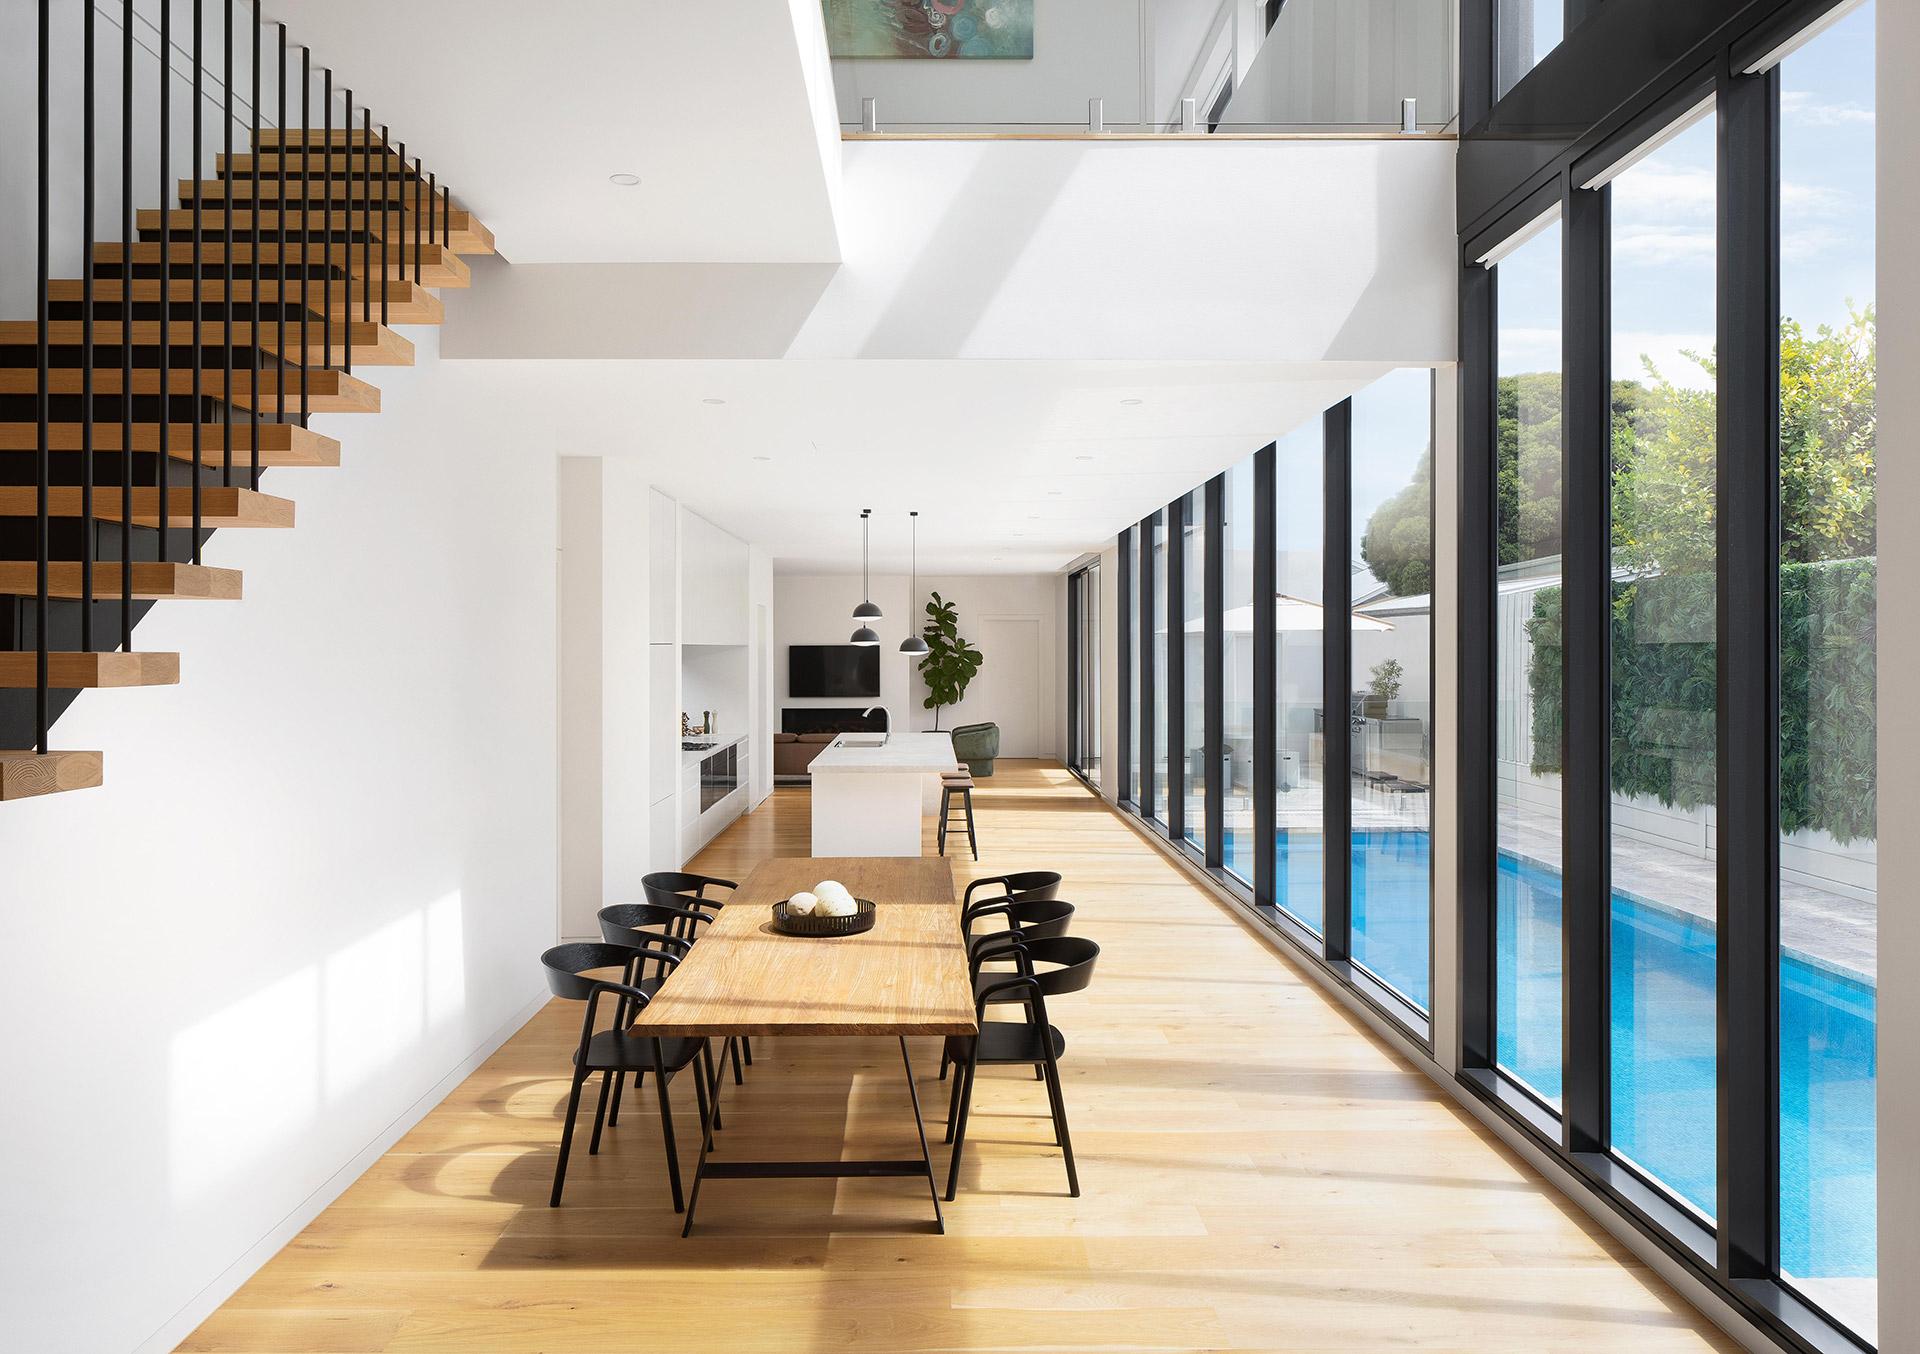 northcote-house-interior-design-kitchen-living-pool-area-ckairouz-architects